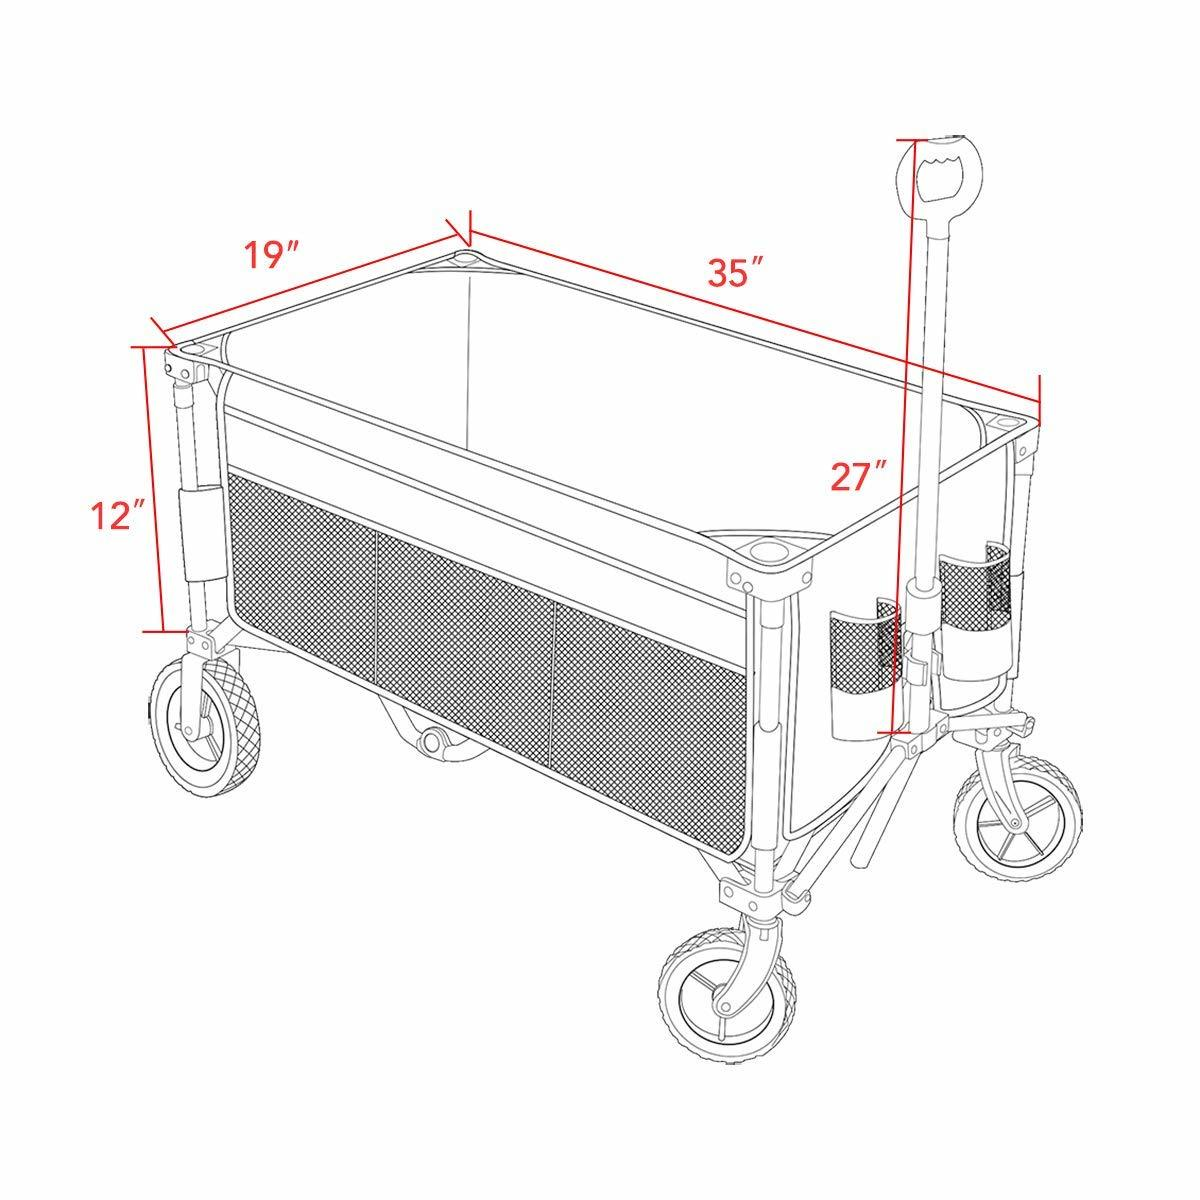 Timber Ridge Camping Wagon Folding Garden Cart Shopping Trolley Collapsible Heav